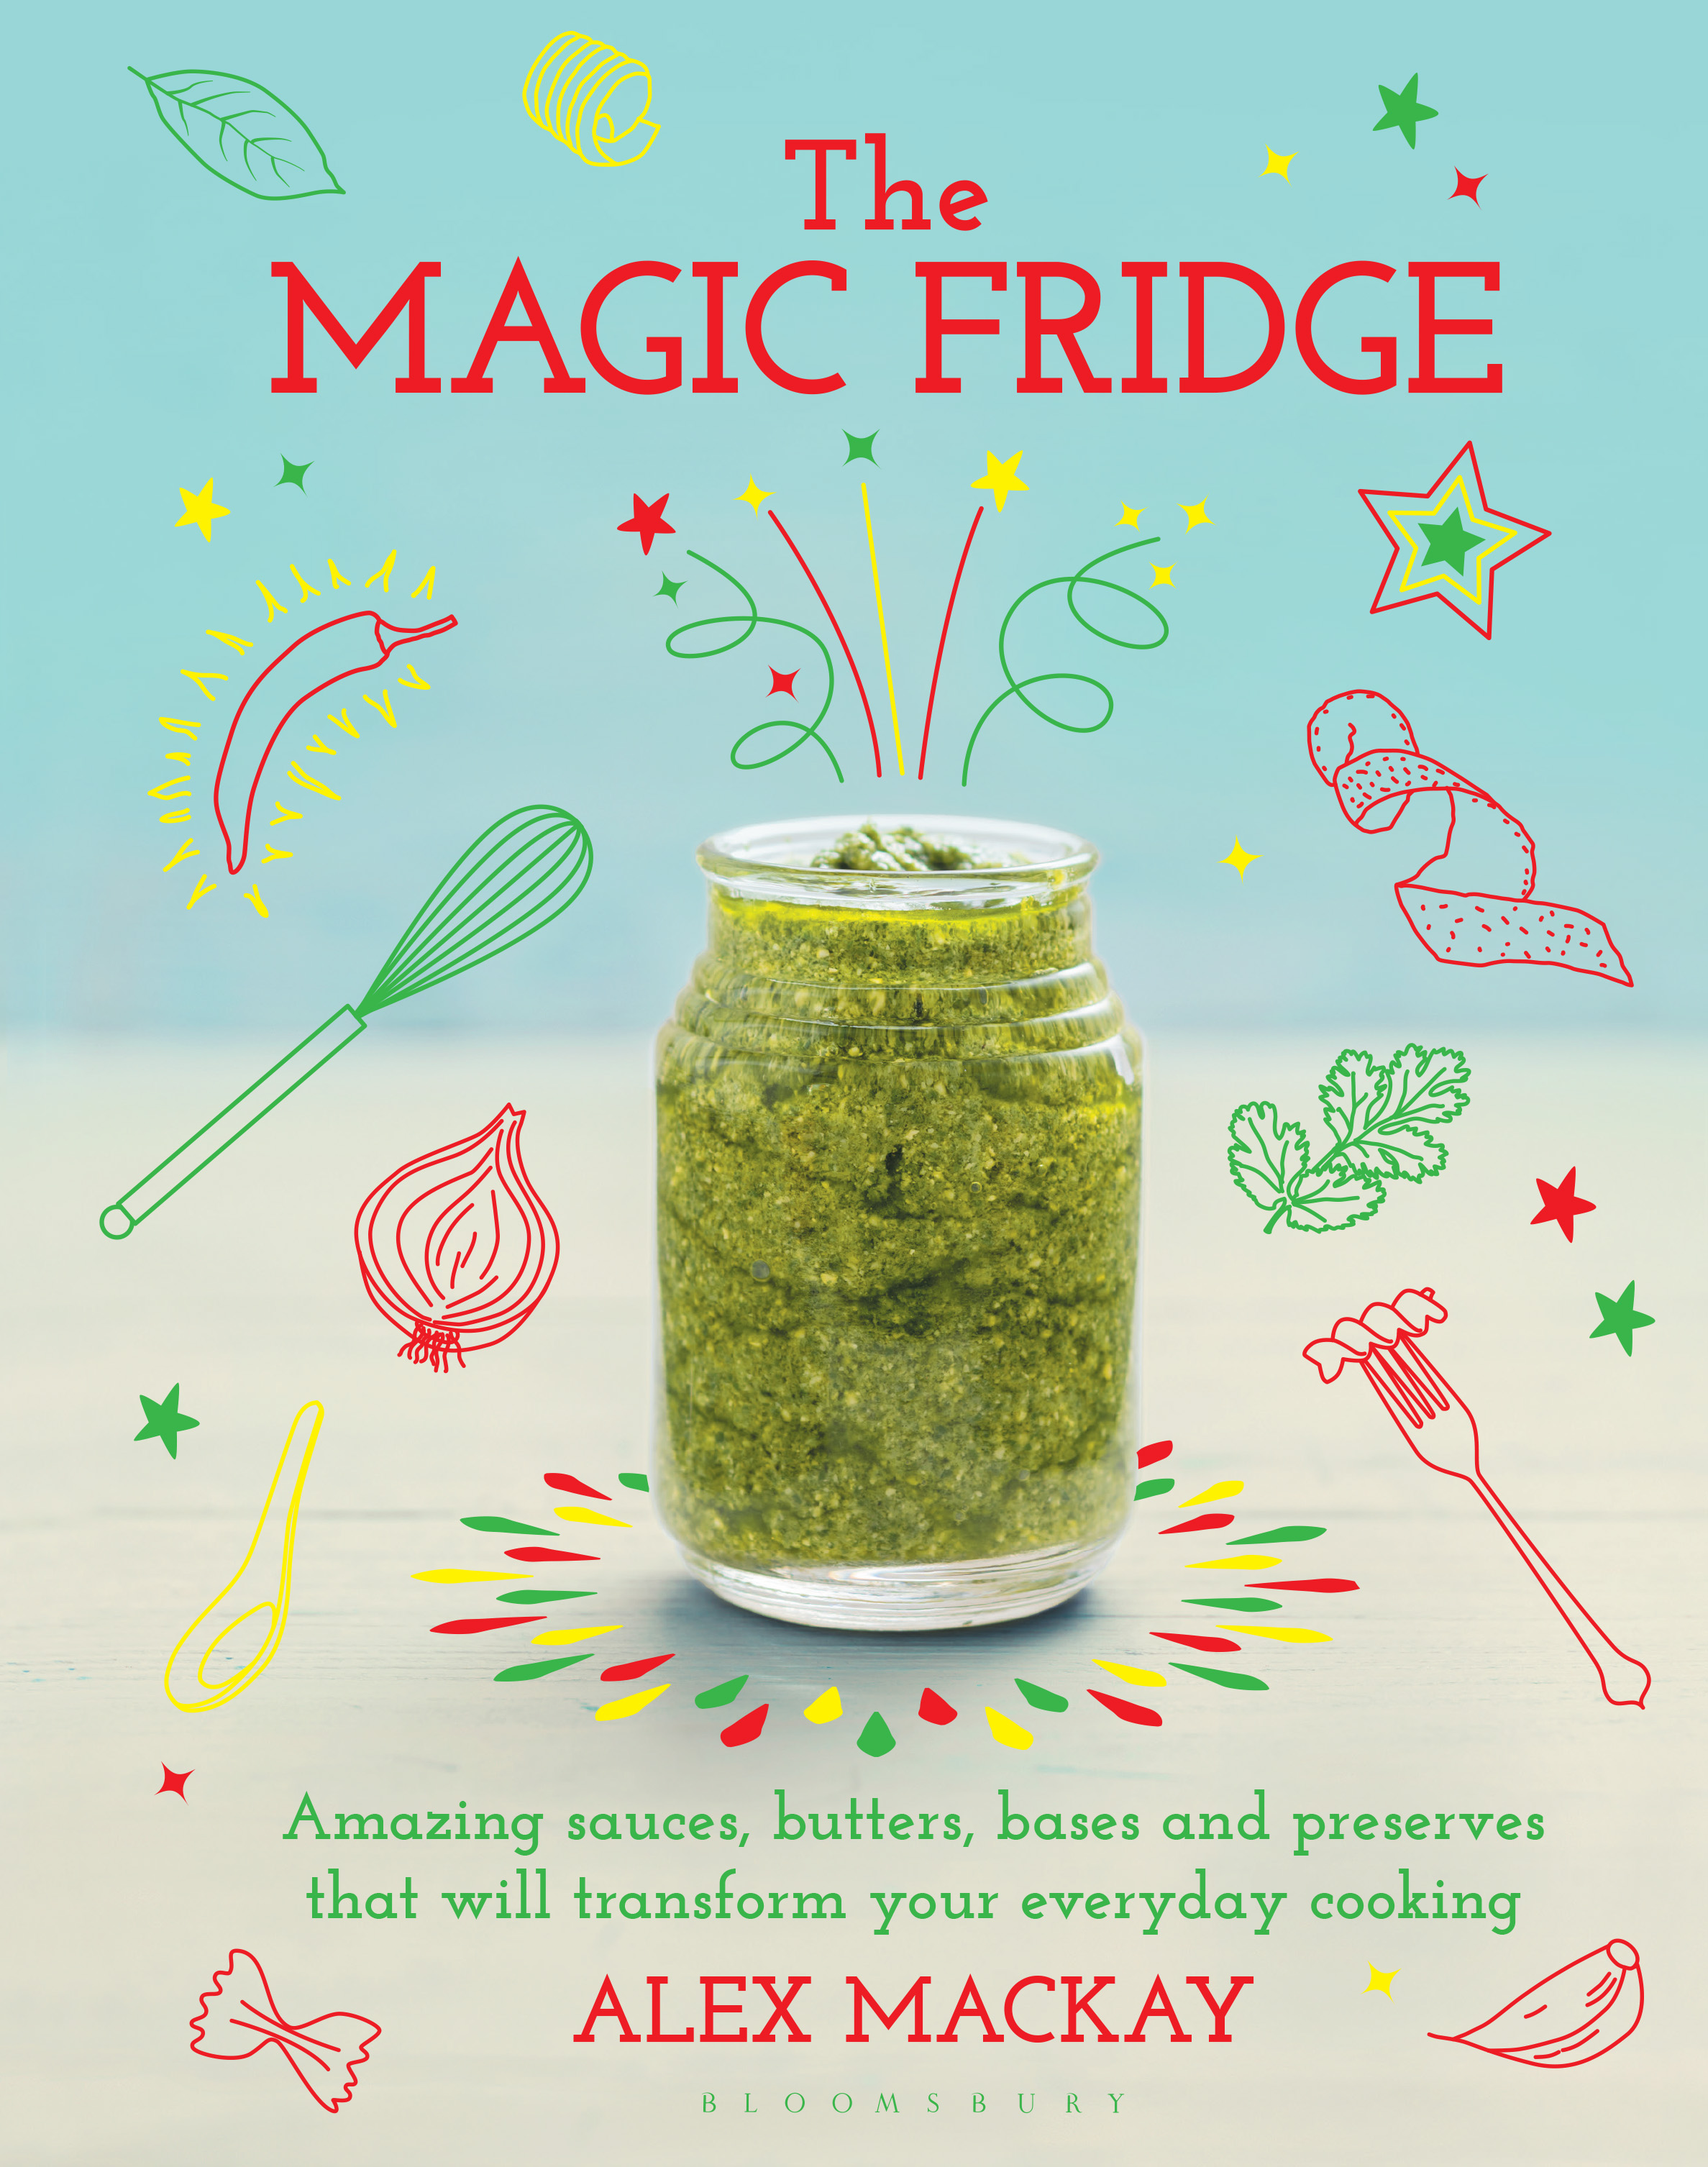 Magic Fridge front cover.jpg